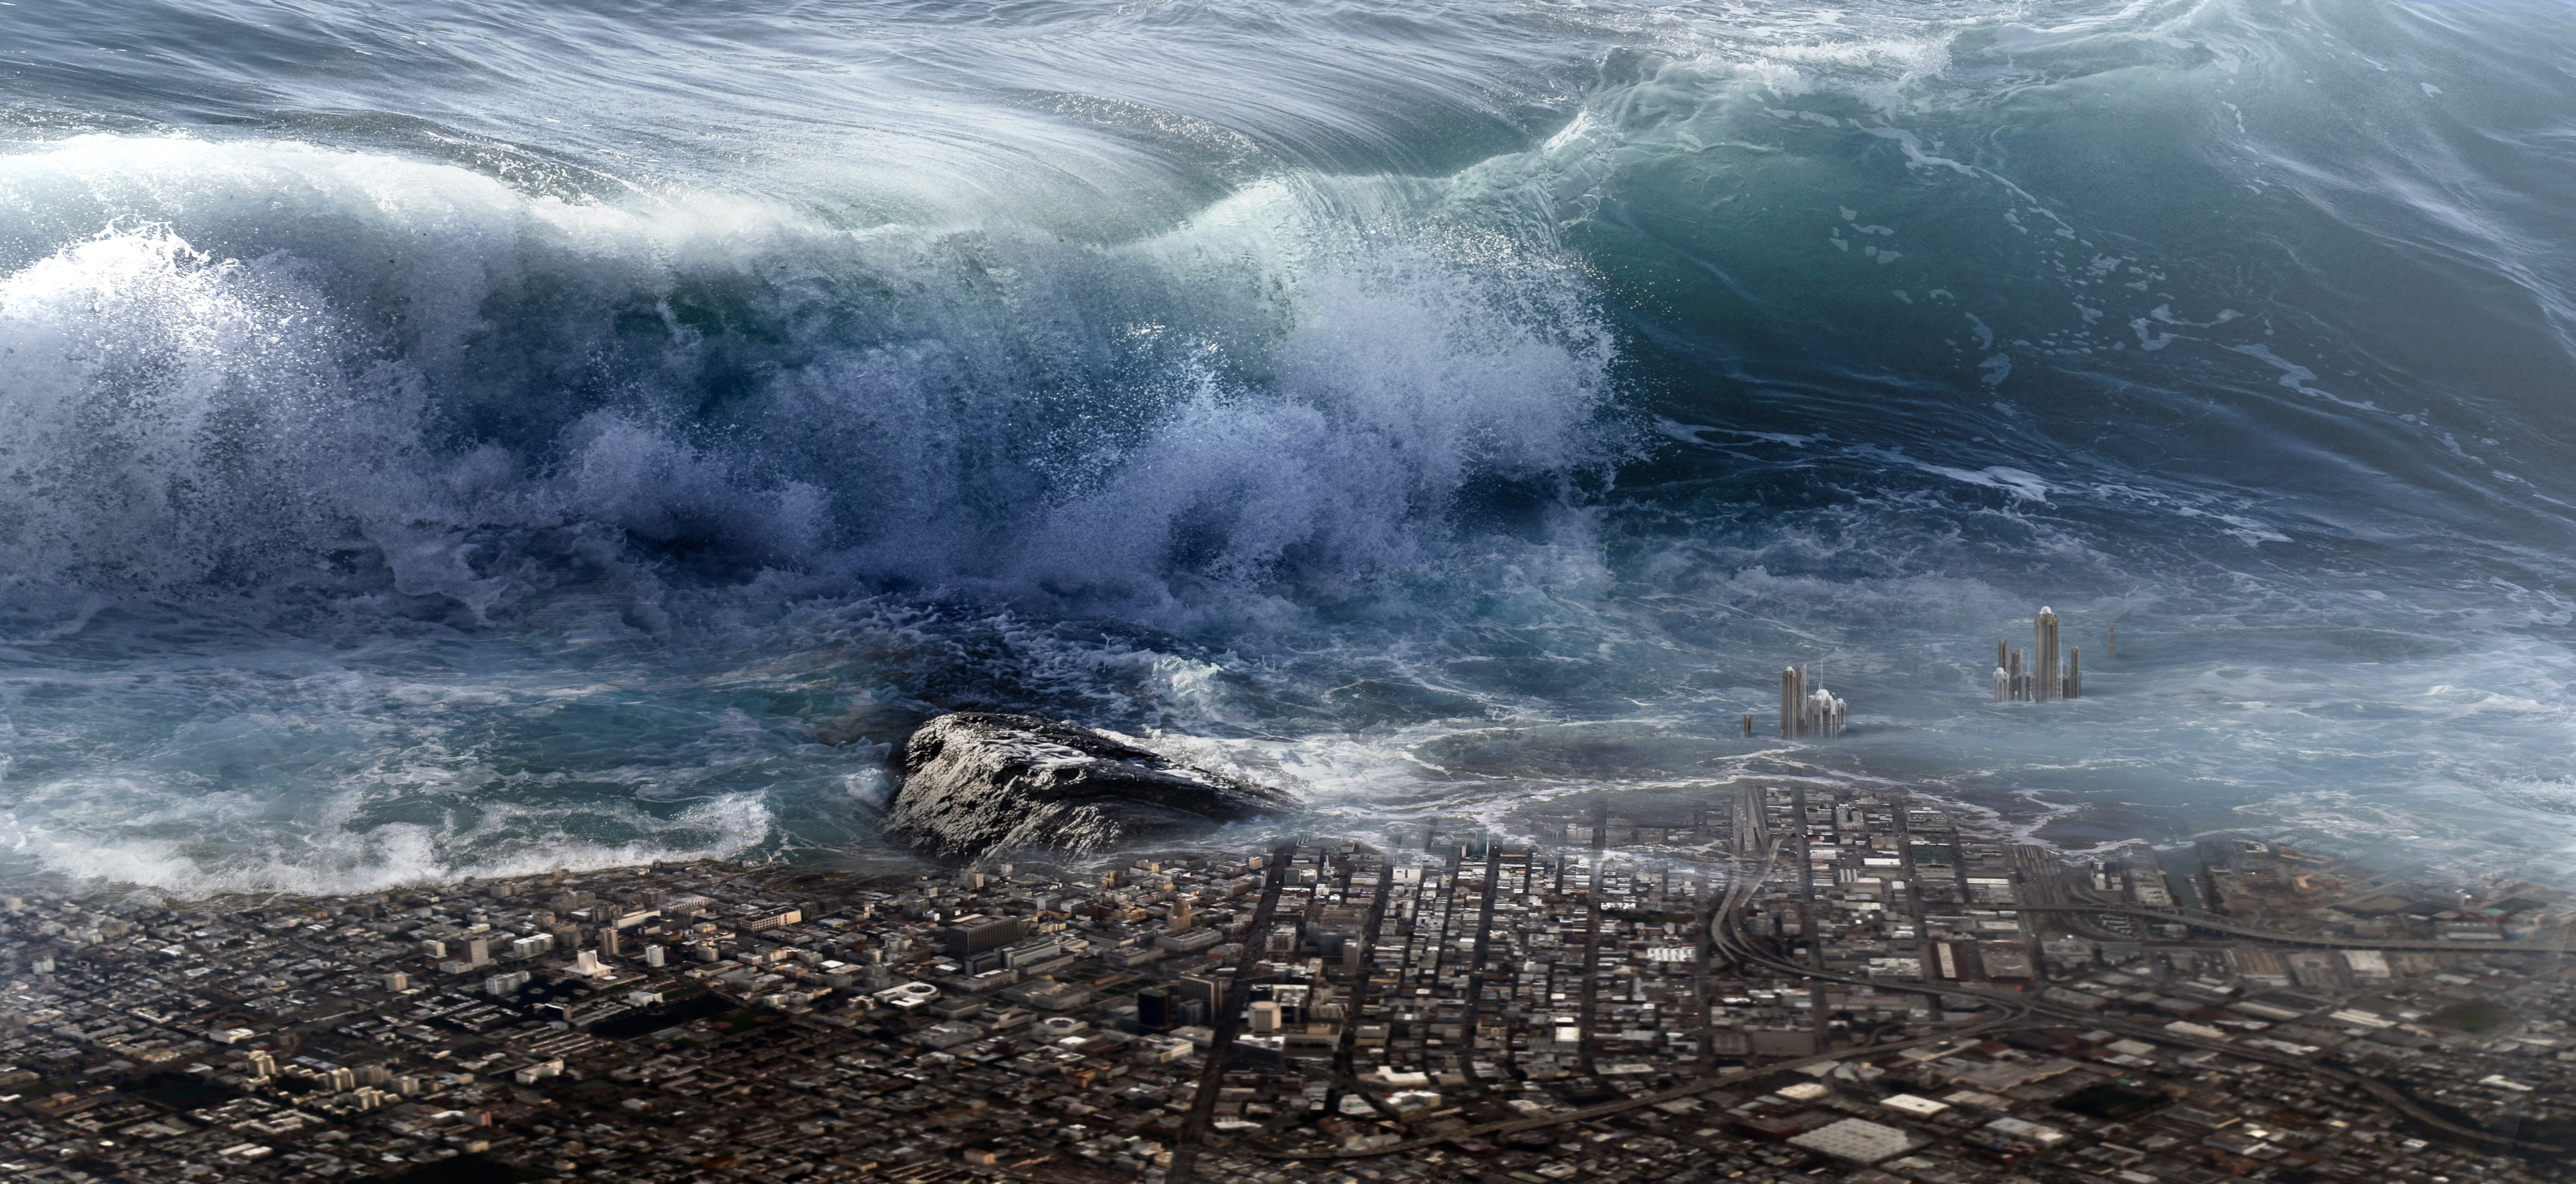 Tsunami (Image by Stefan Keller from Pixabay)